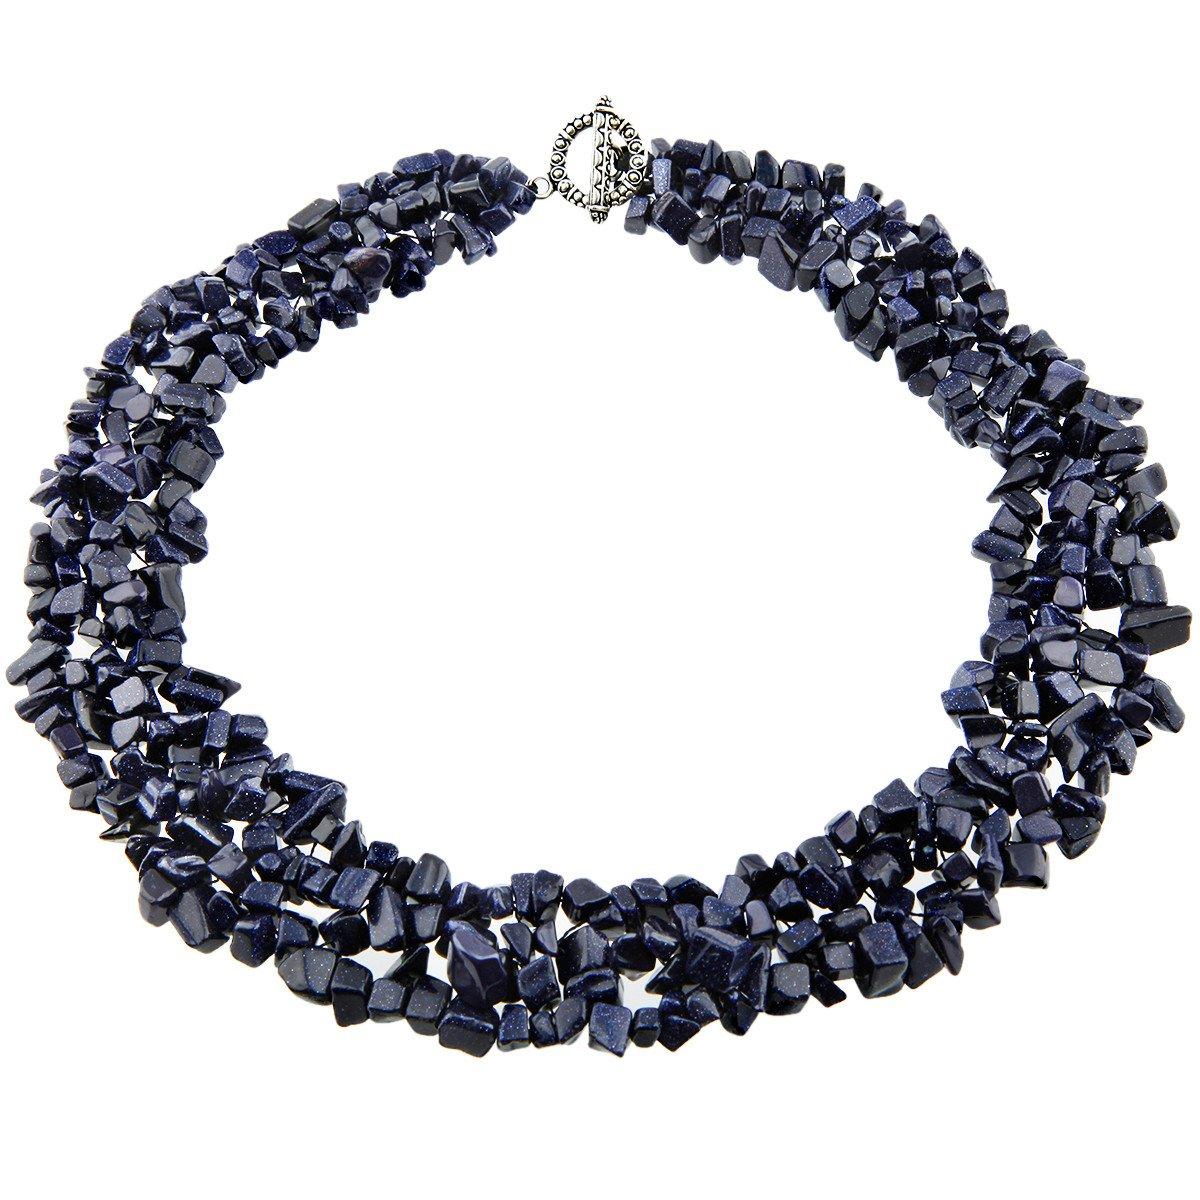 SUNYIK Blue Sand Tumbled Stone Bib Necklace Collar